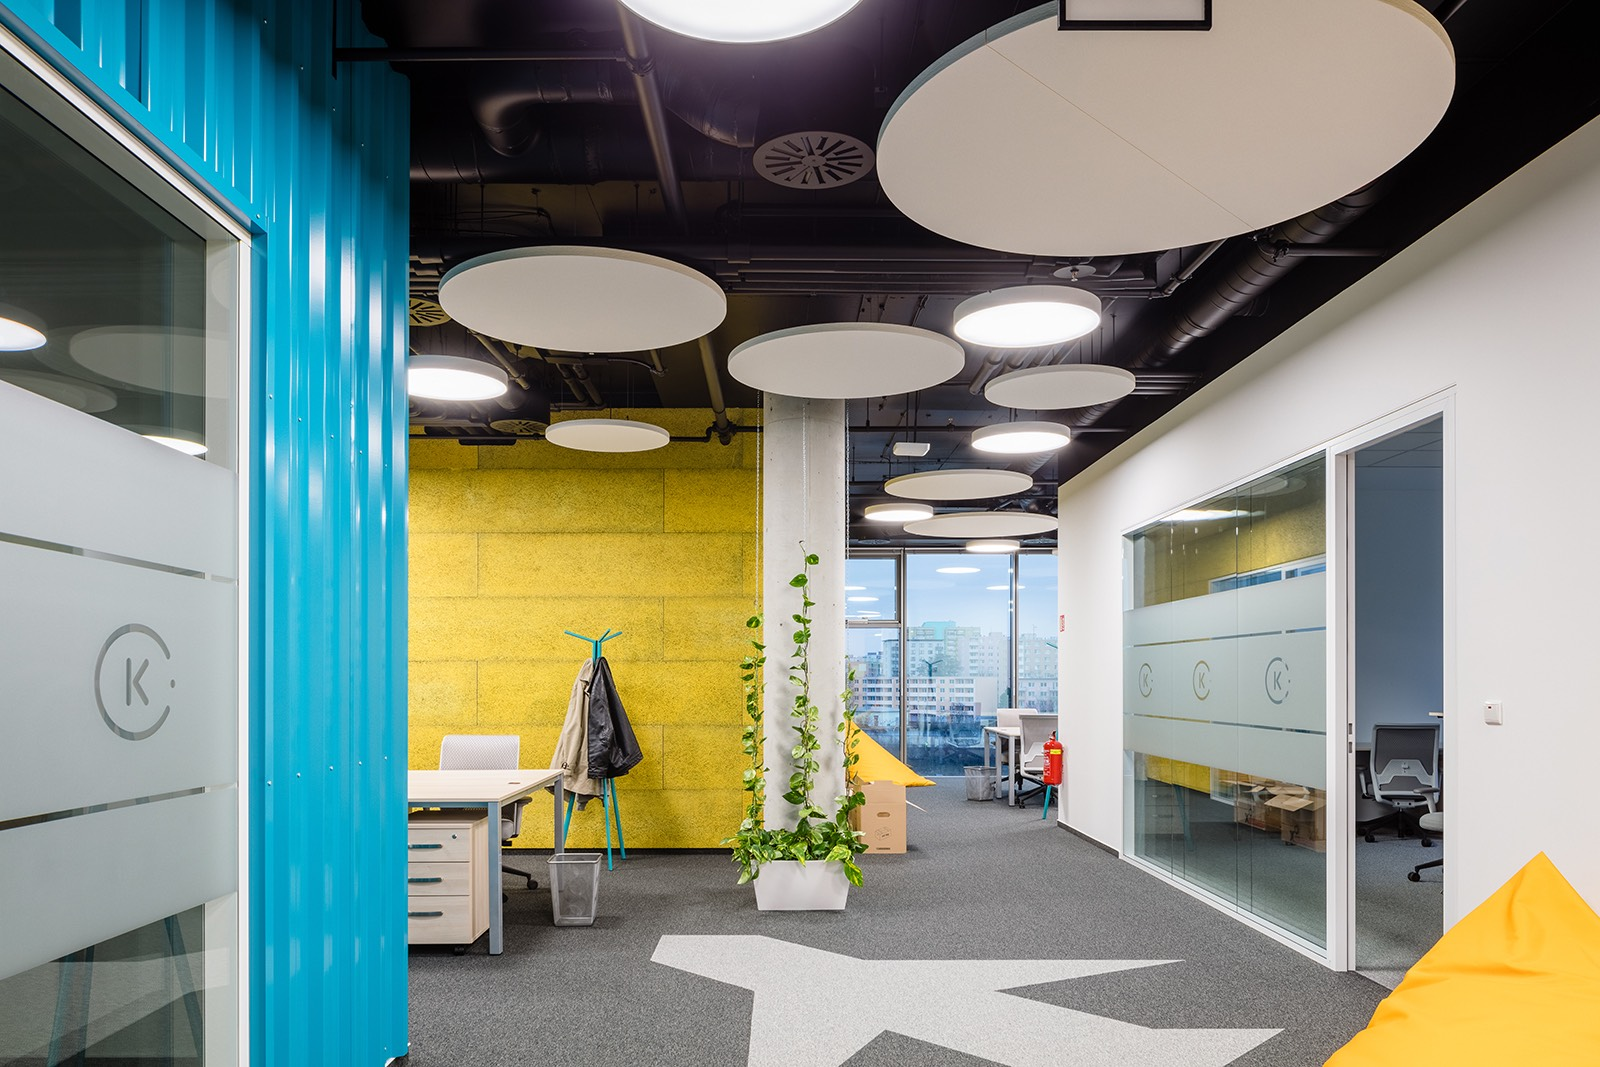 kiwi-office-brno-11